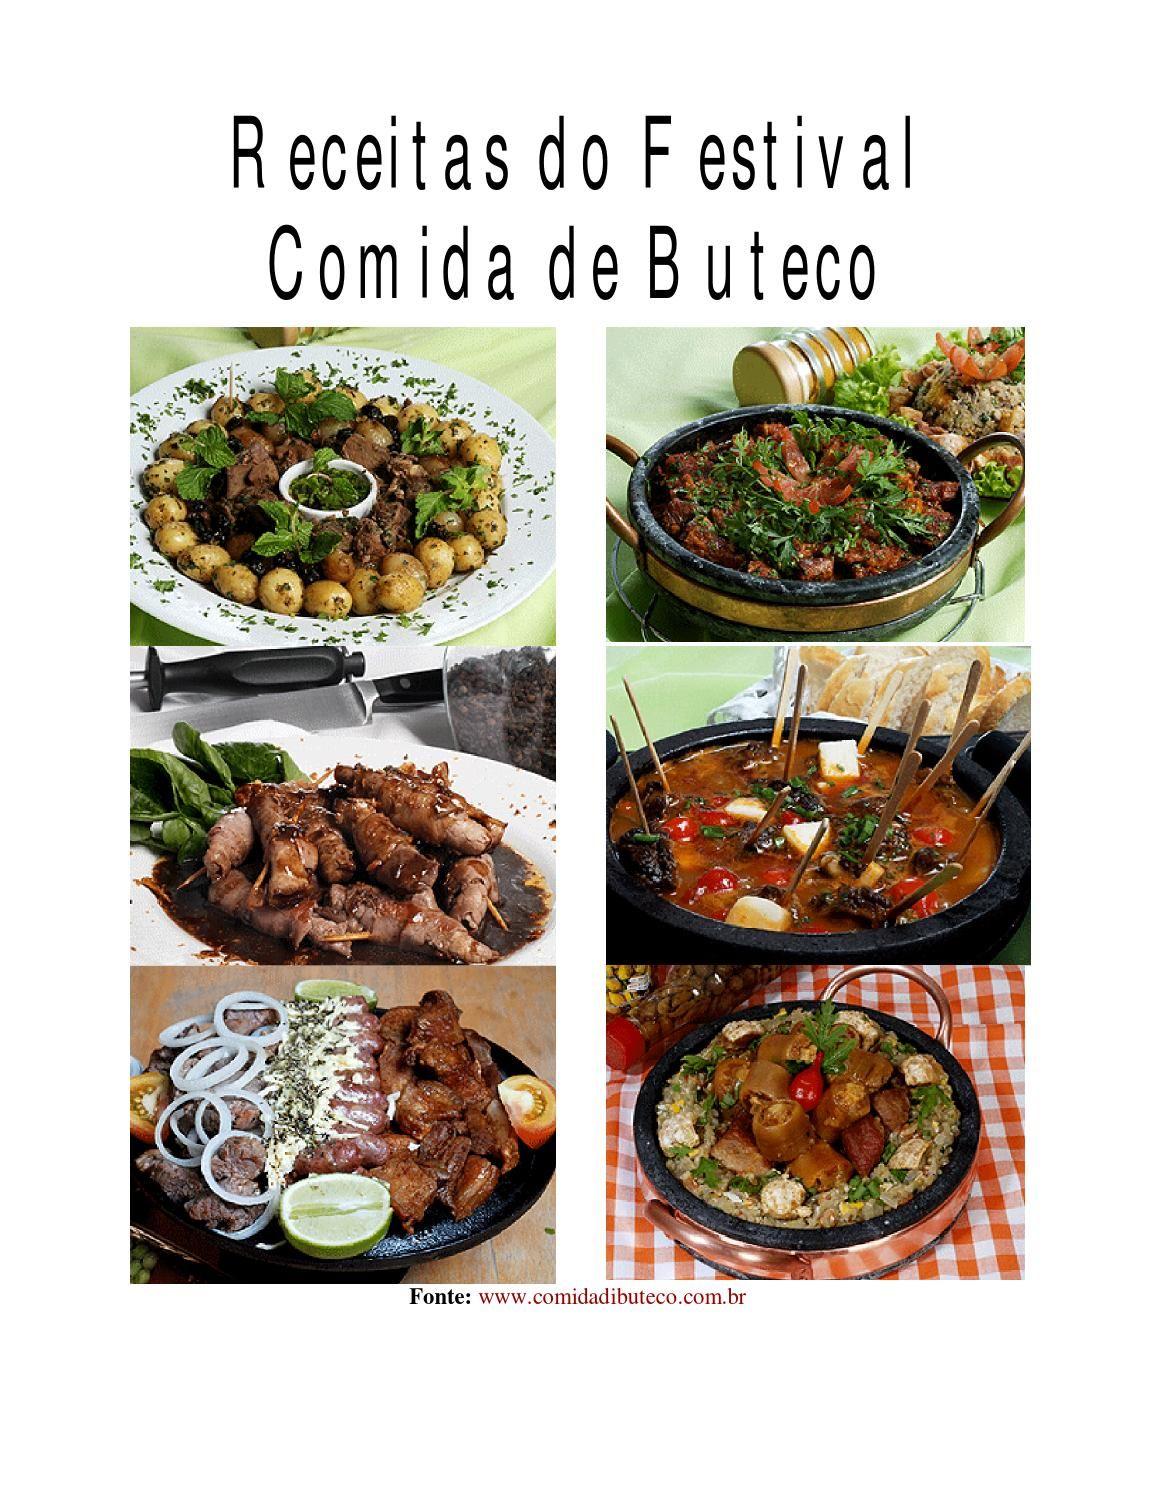 Comida de Buteco